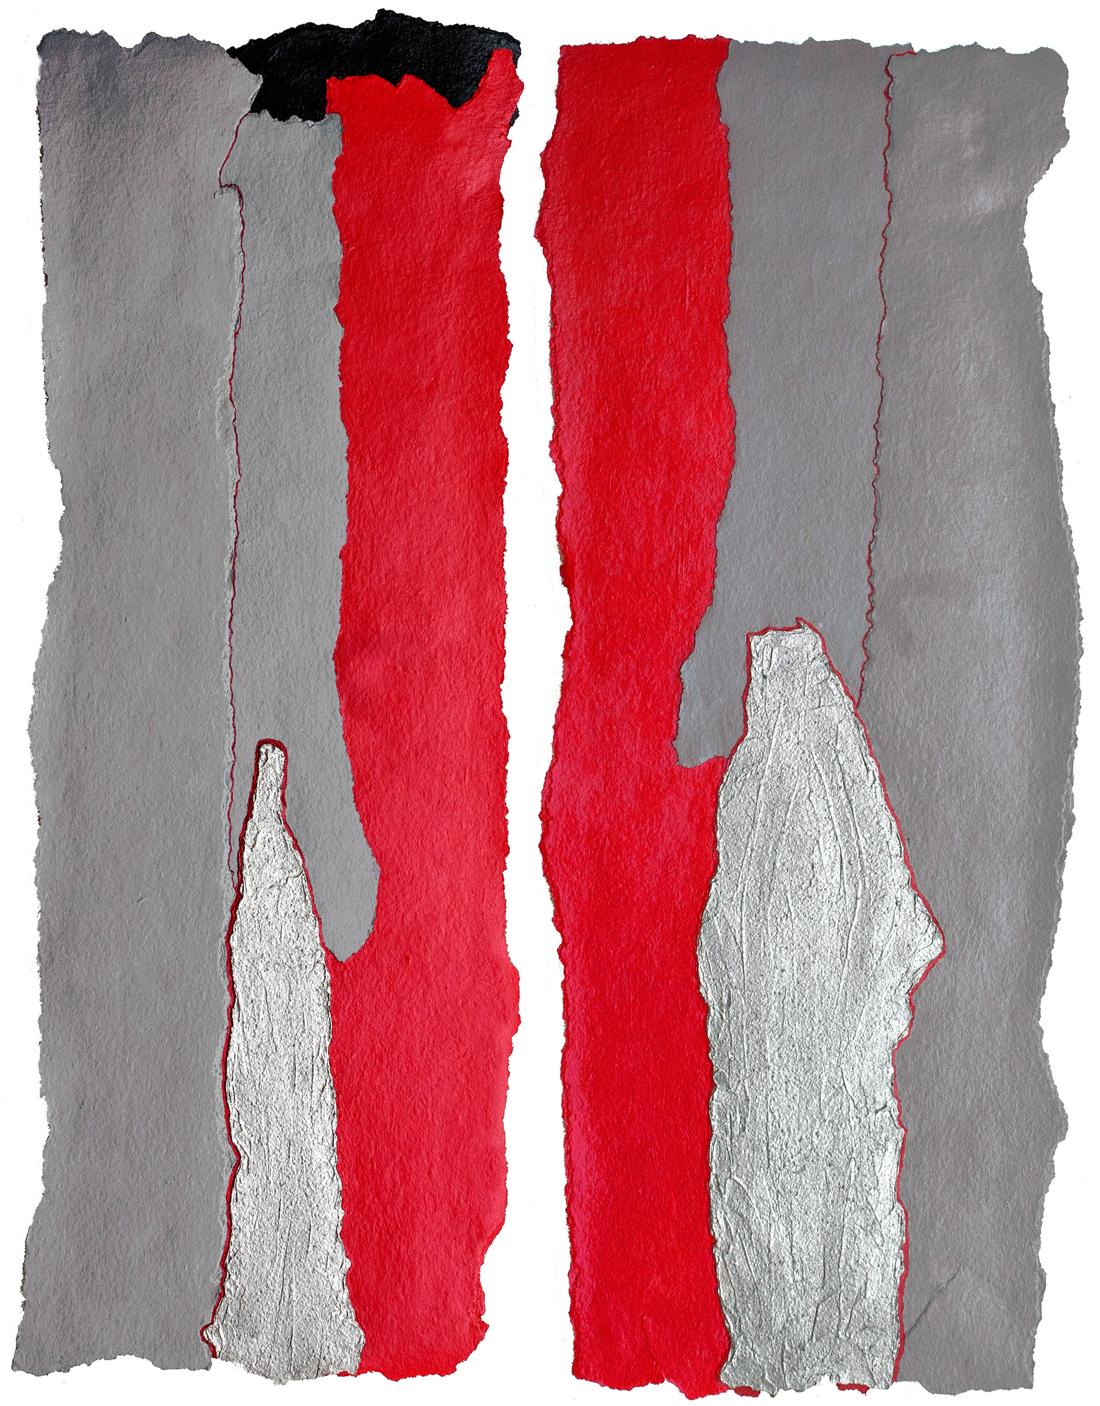 Red & Grey  Diptych